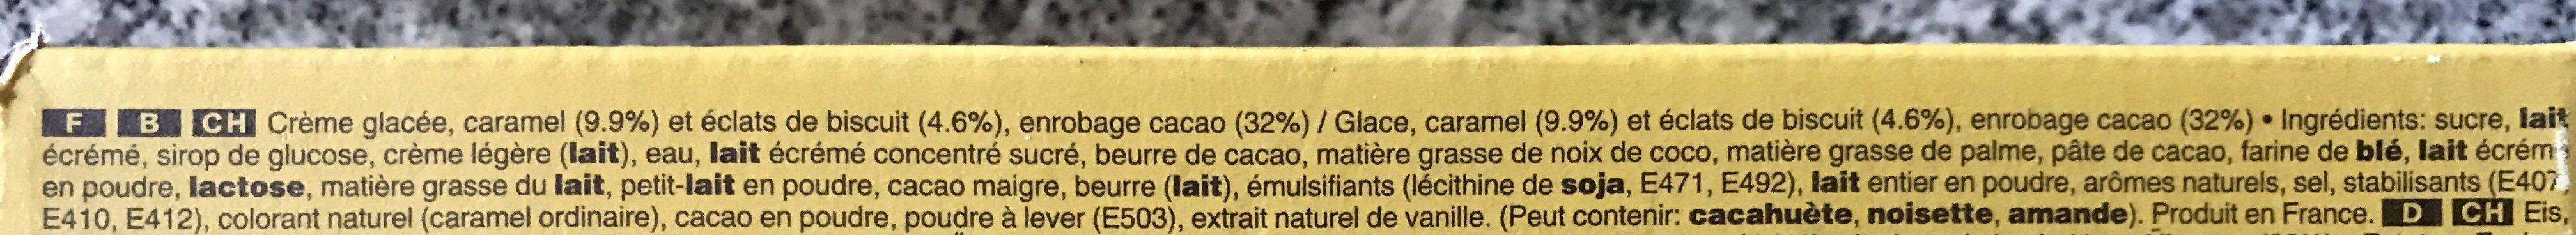 Twix Ice Cream Bar - Ingredientes - fr